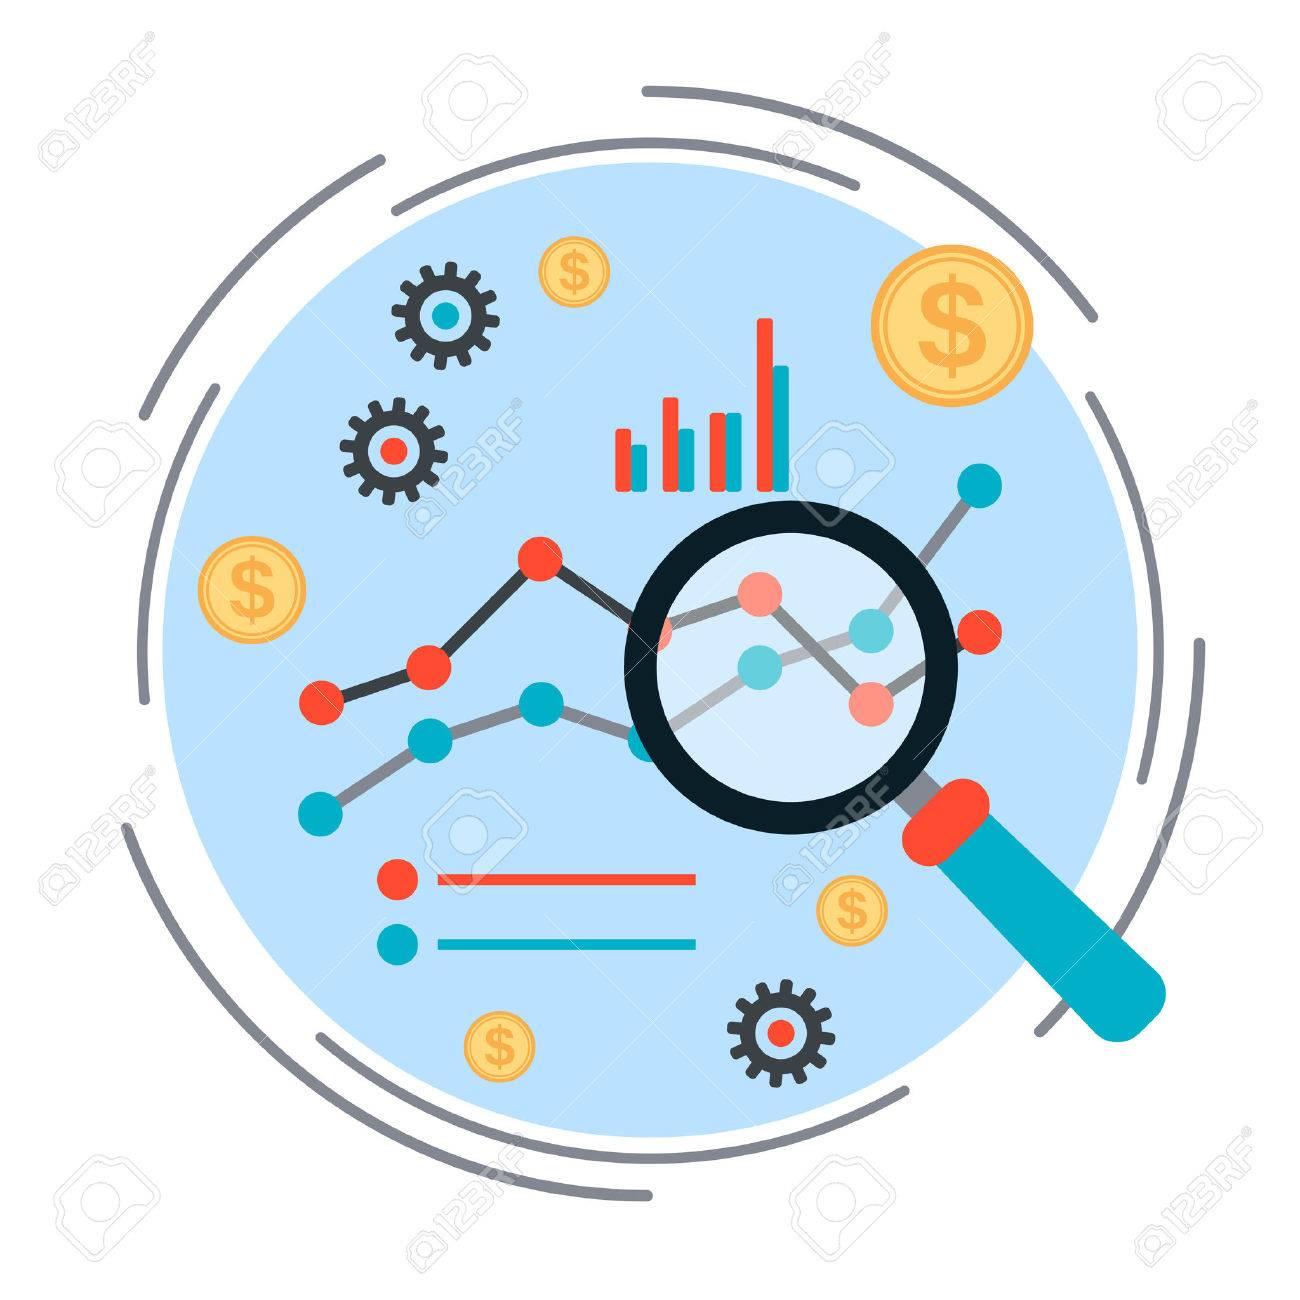 Business chart, financial statistics, market analysis concept - 42623768